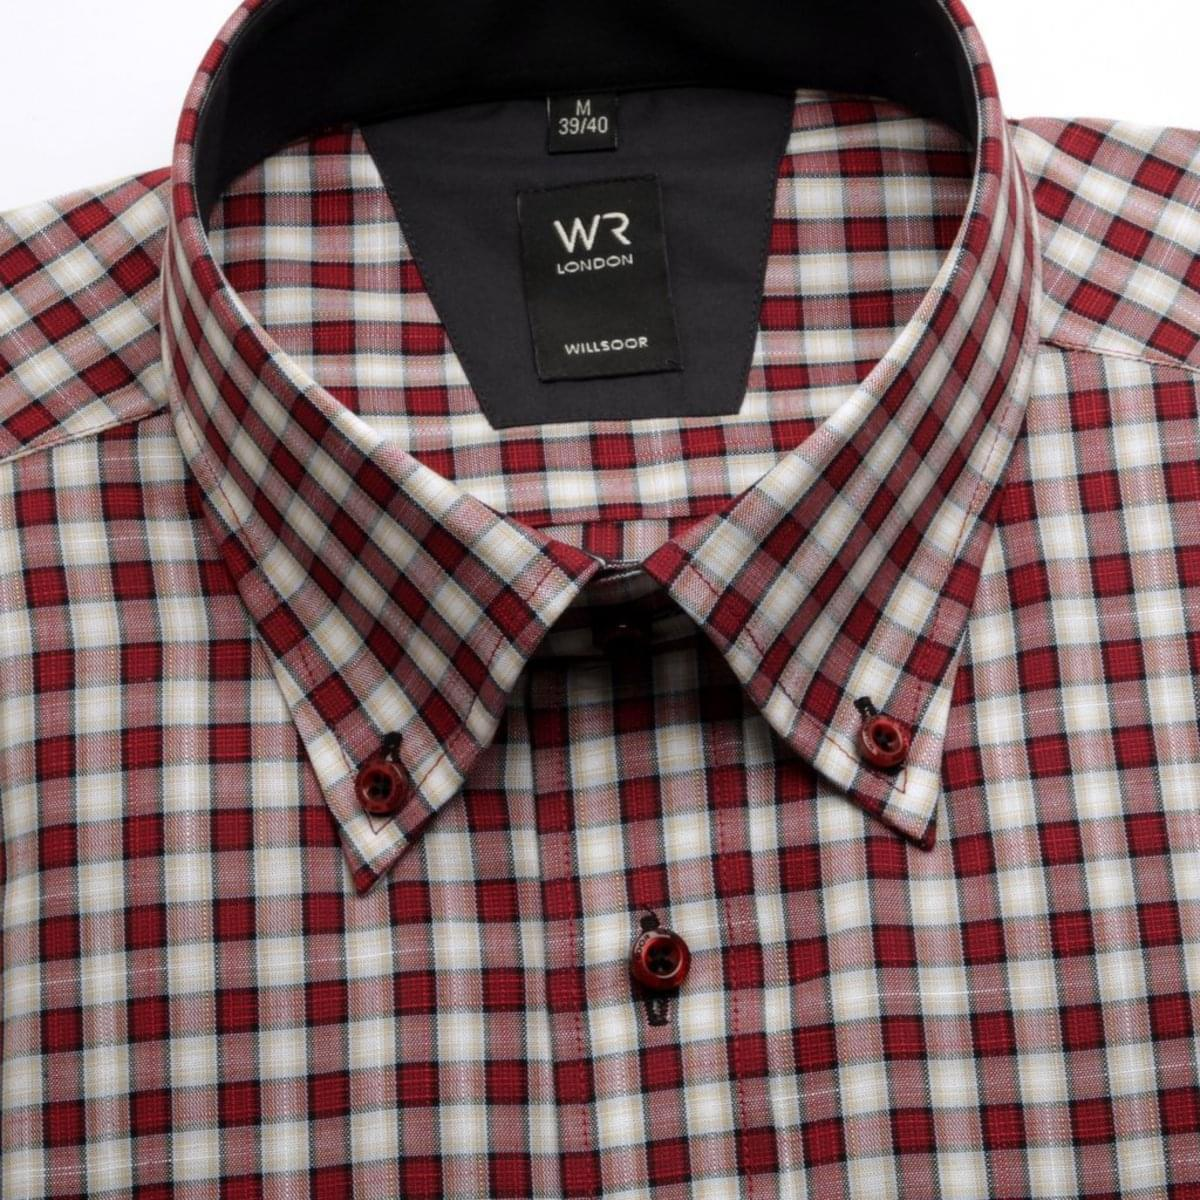 Willsoor Pánská košile WR London (výška 188-194) 1910 188-194 / L (41/42)